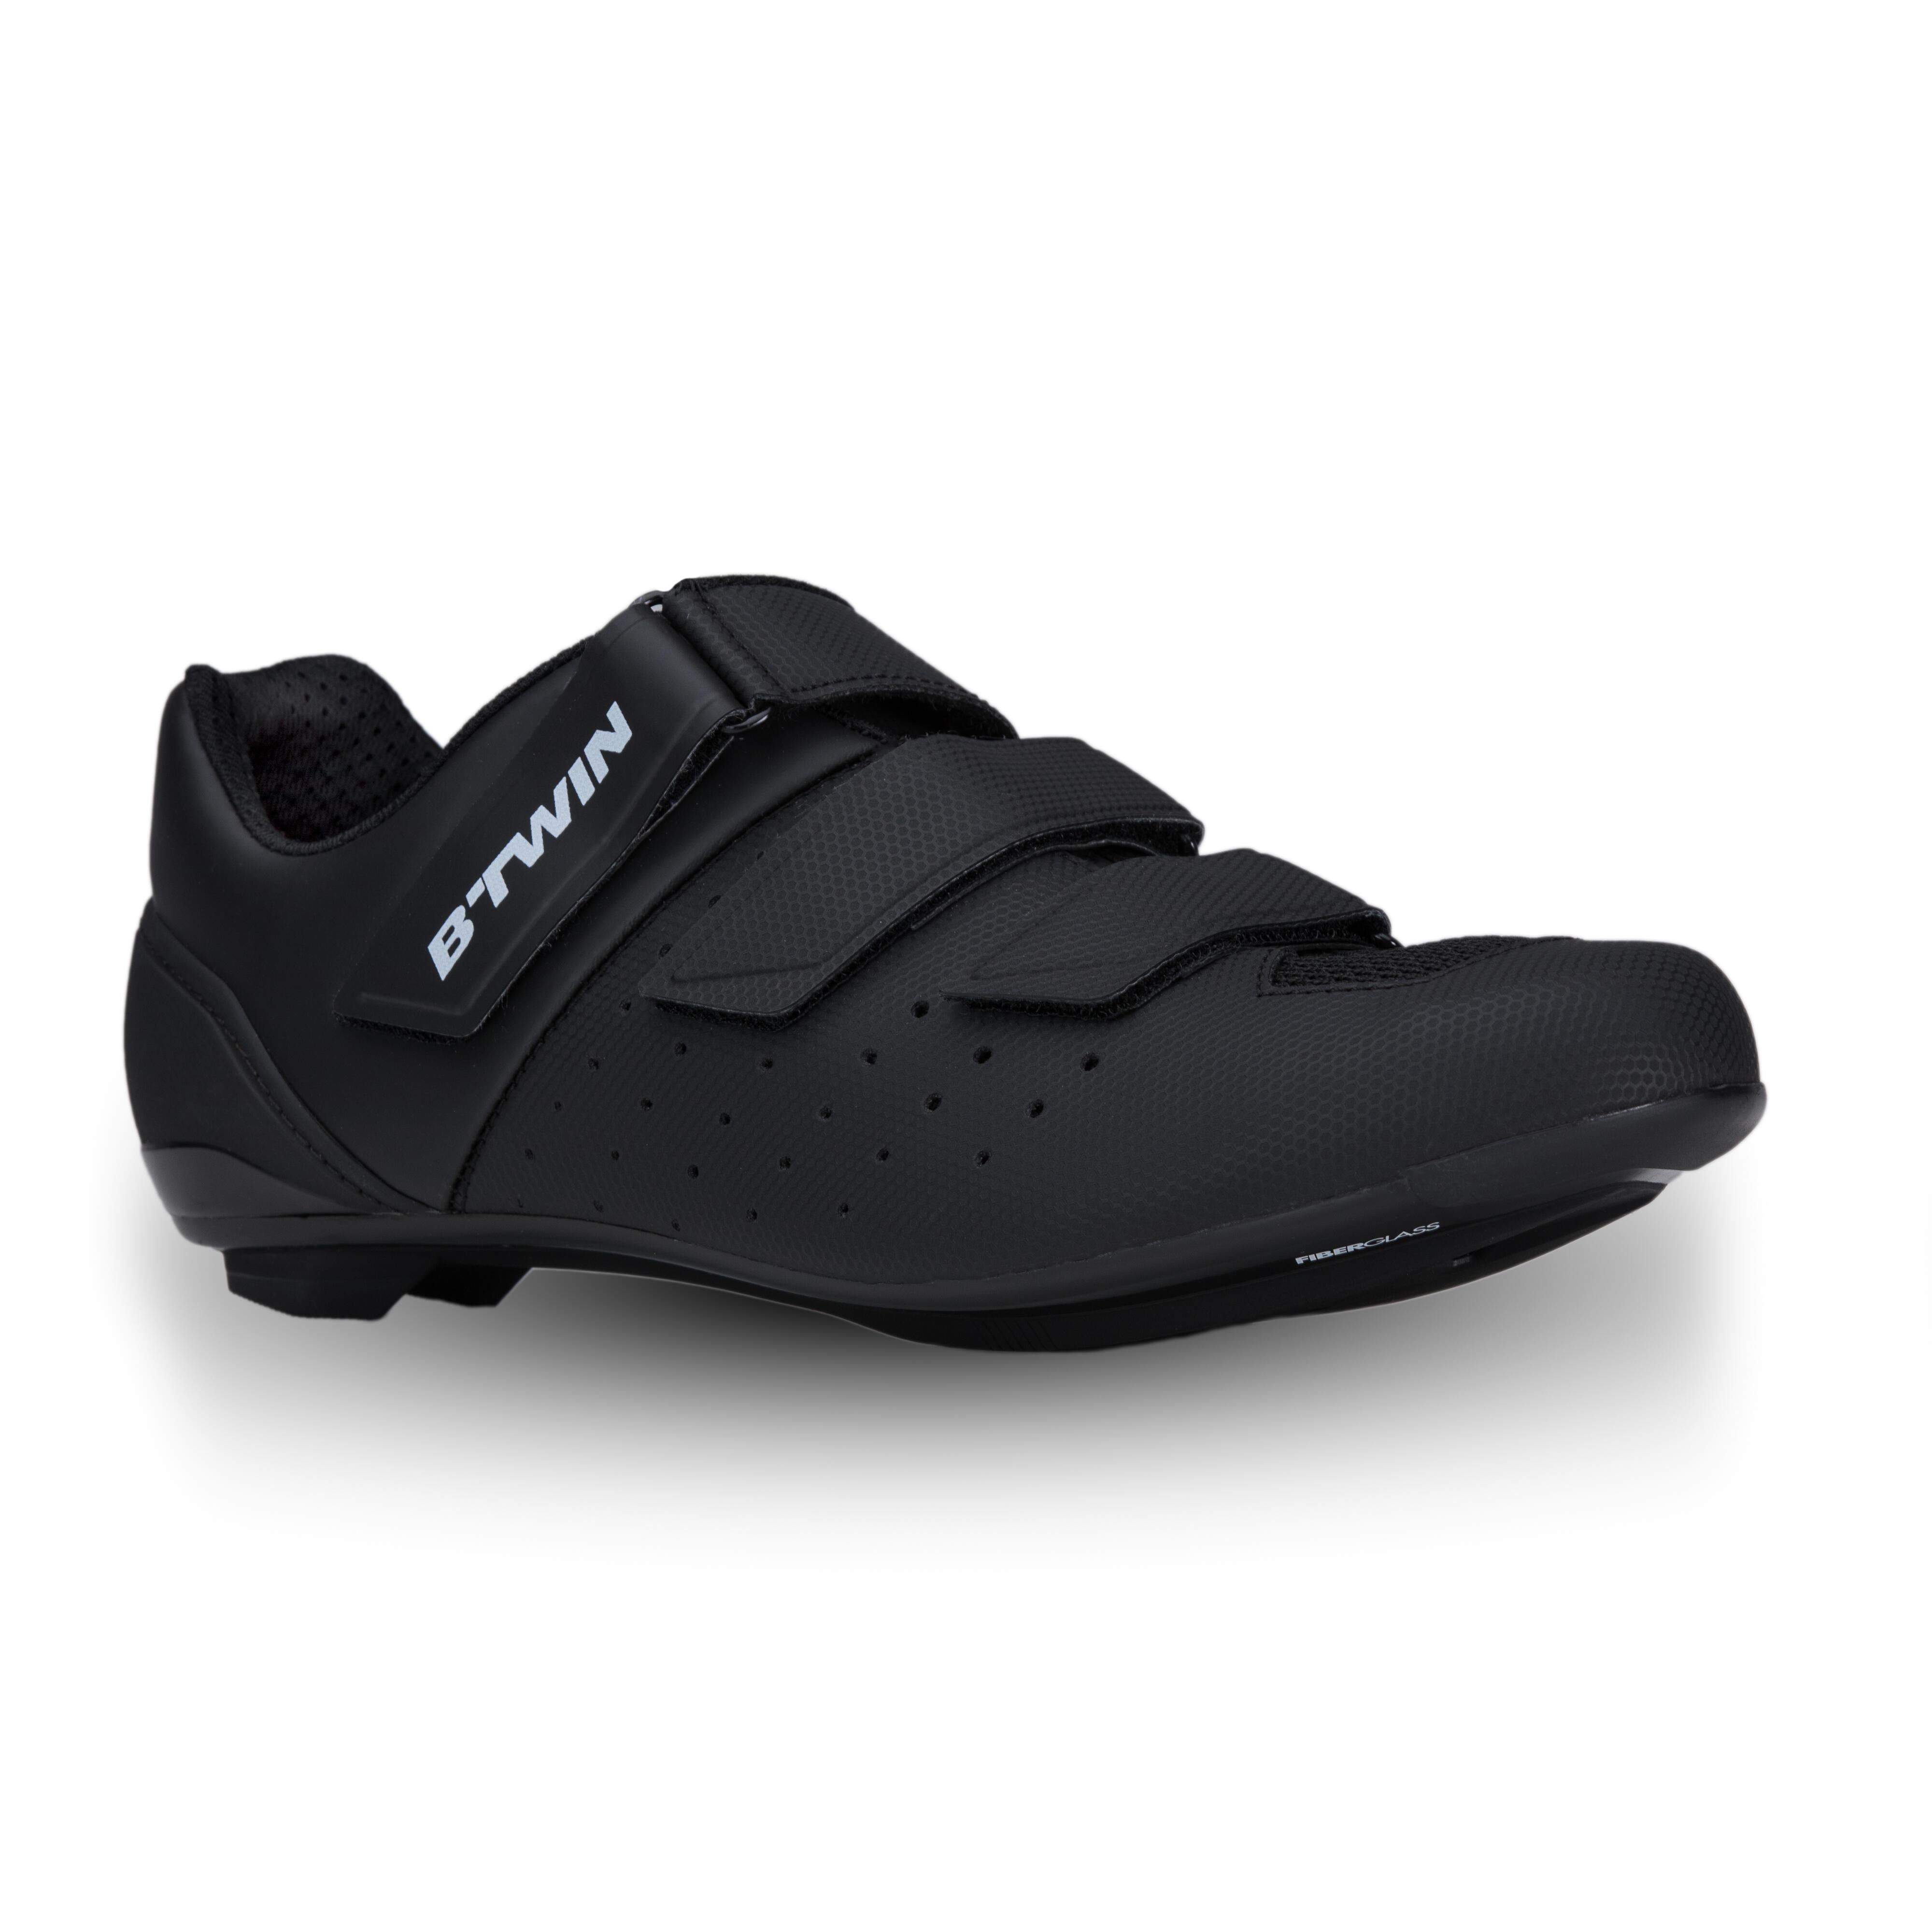 Fahrradschuhe Rennrad 500 schwarz | Schuhe > Sportschuhe > Fahrradschuhe | Schwarz | B´twin